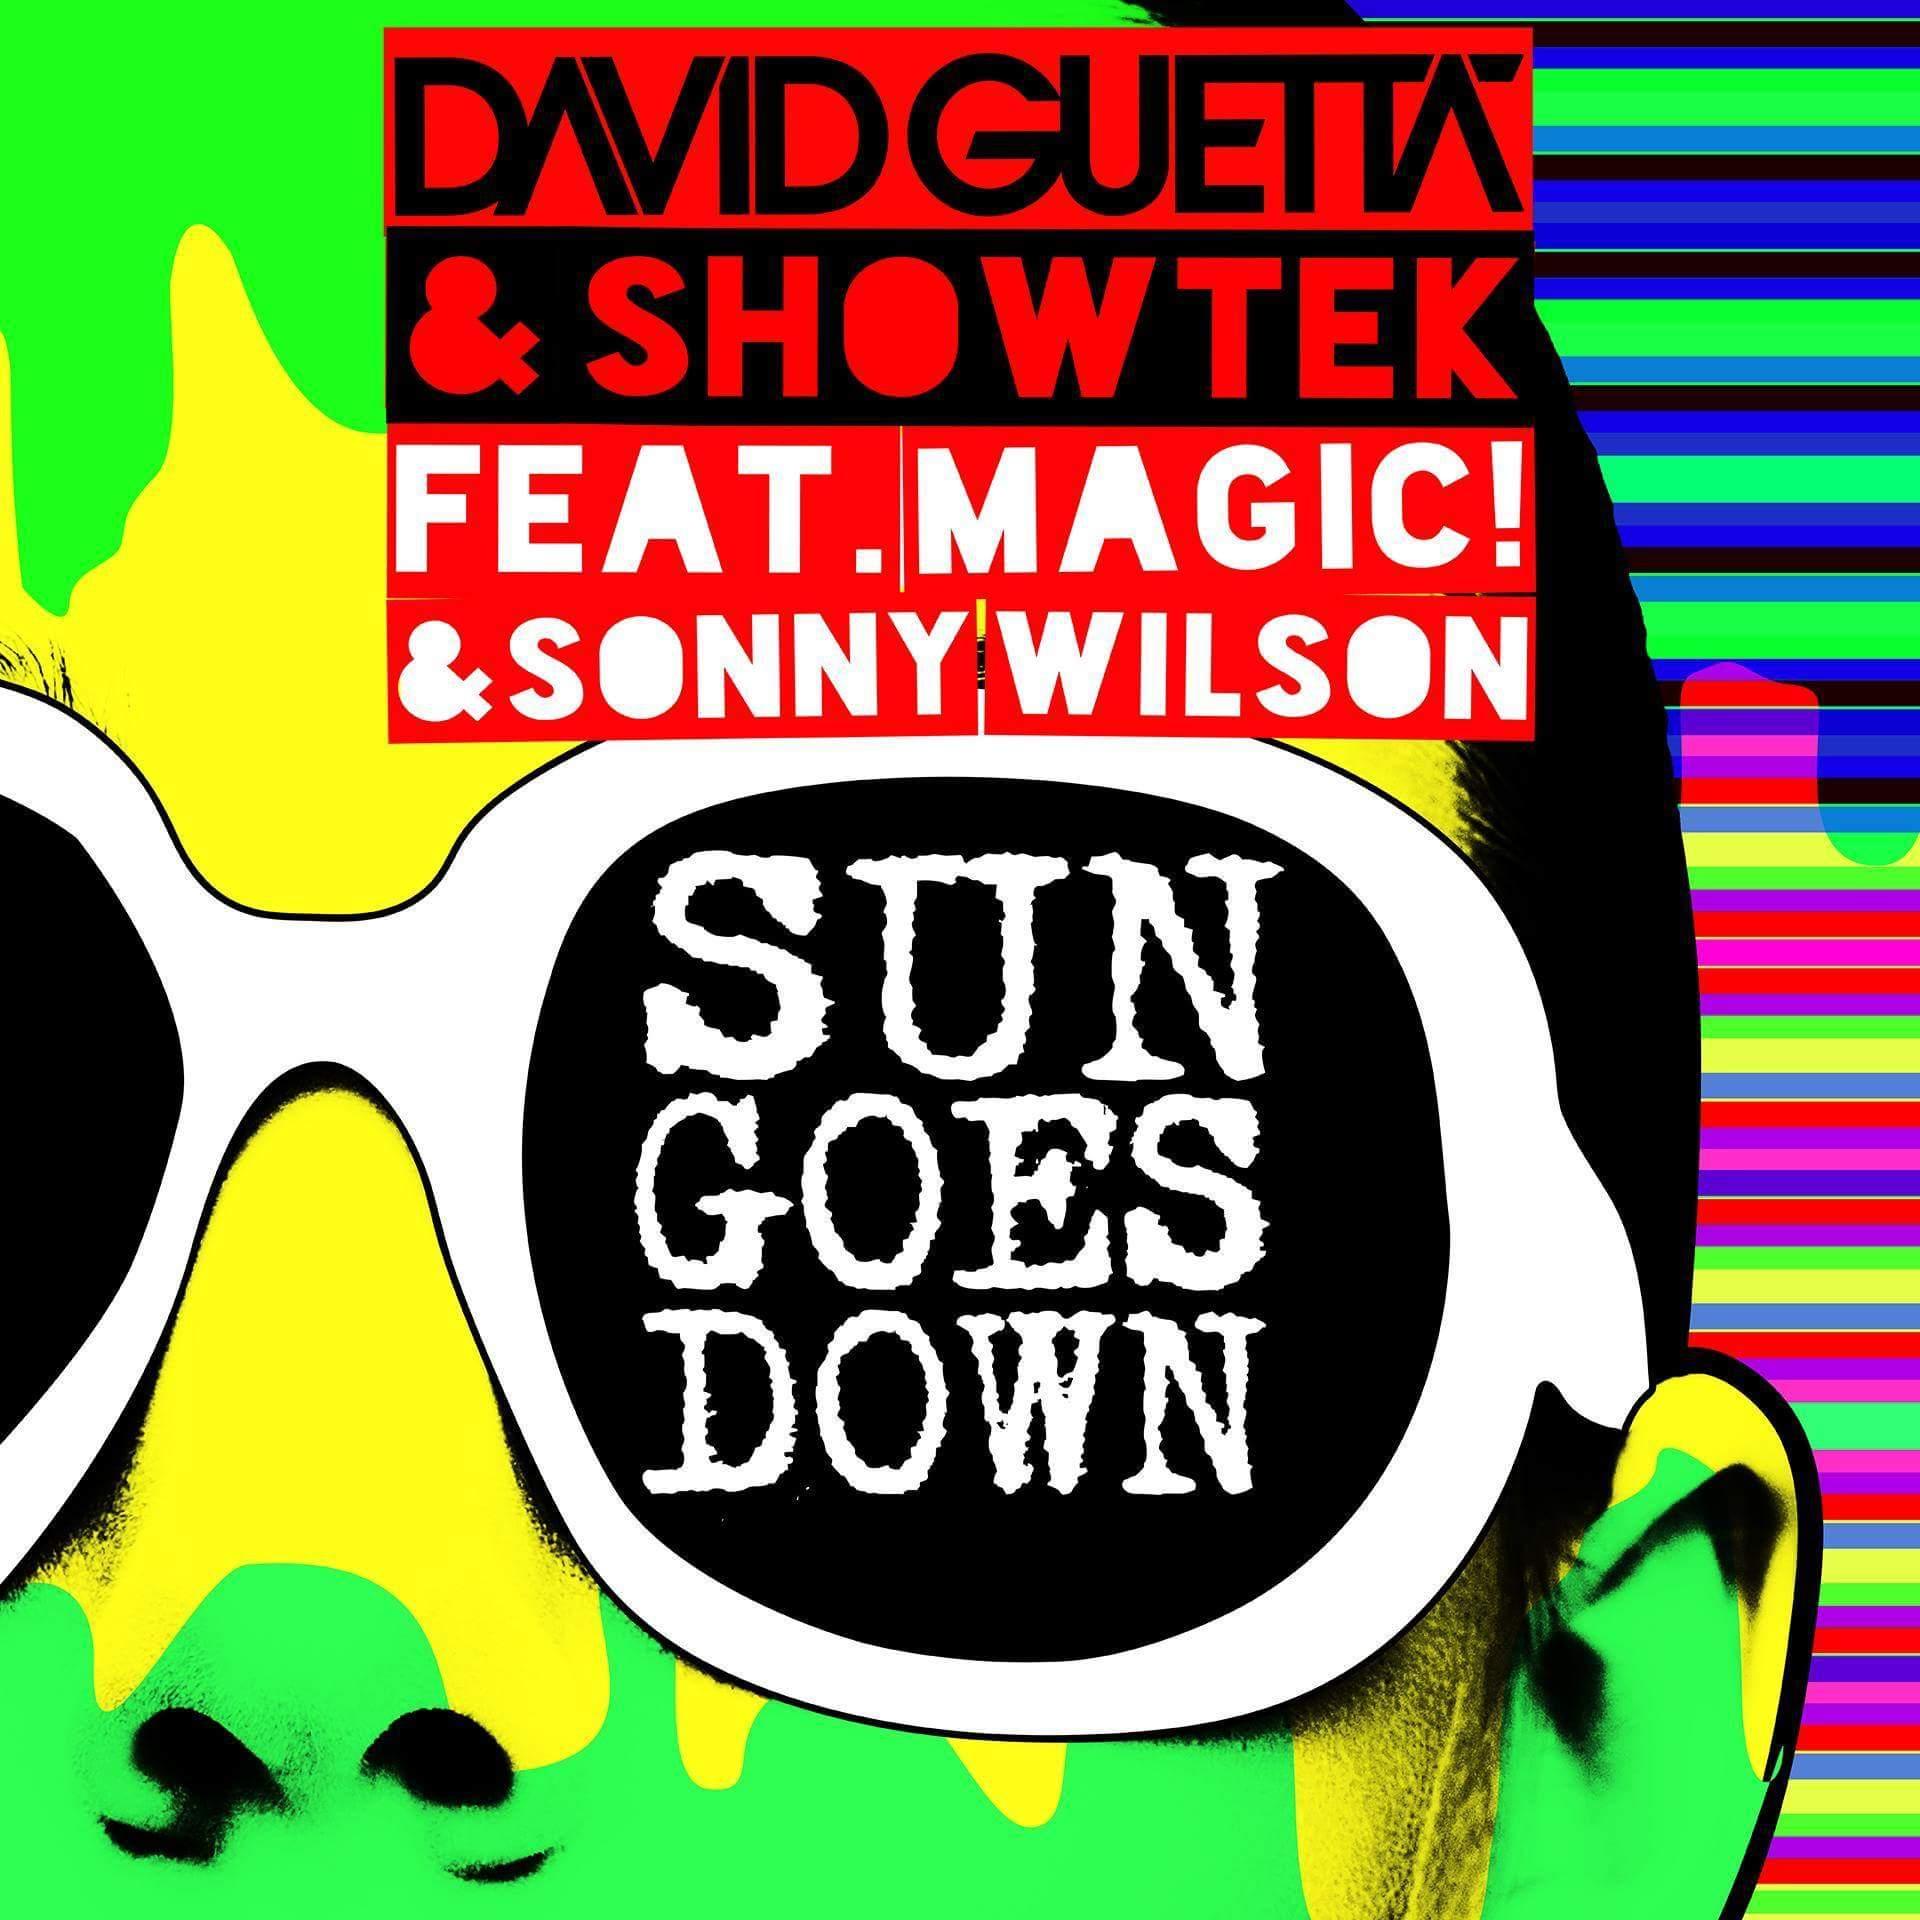 David Guetta & Showtek – Sun Goes Down ft Magic! & Sonny Wilson